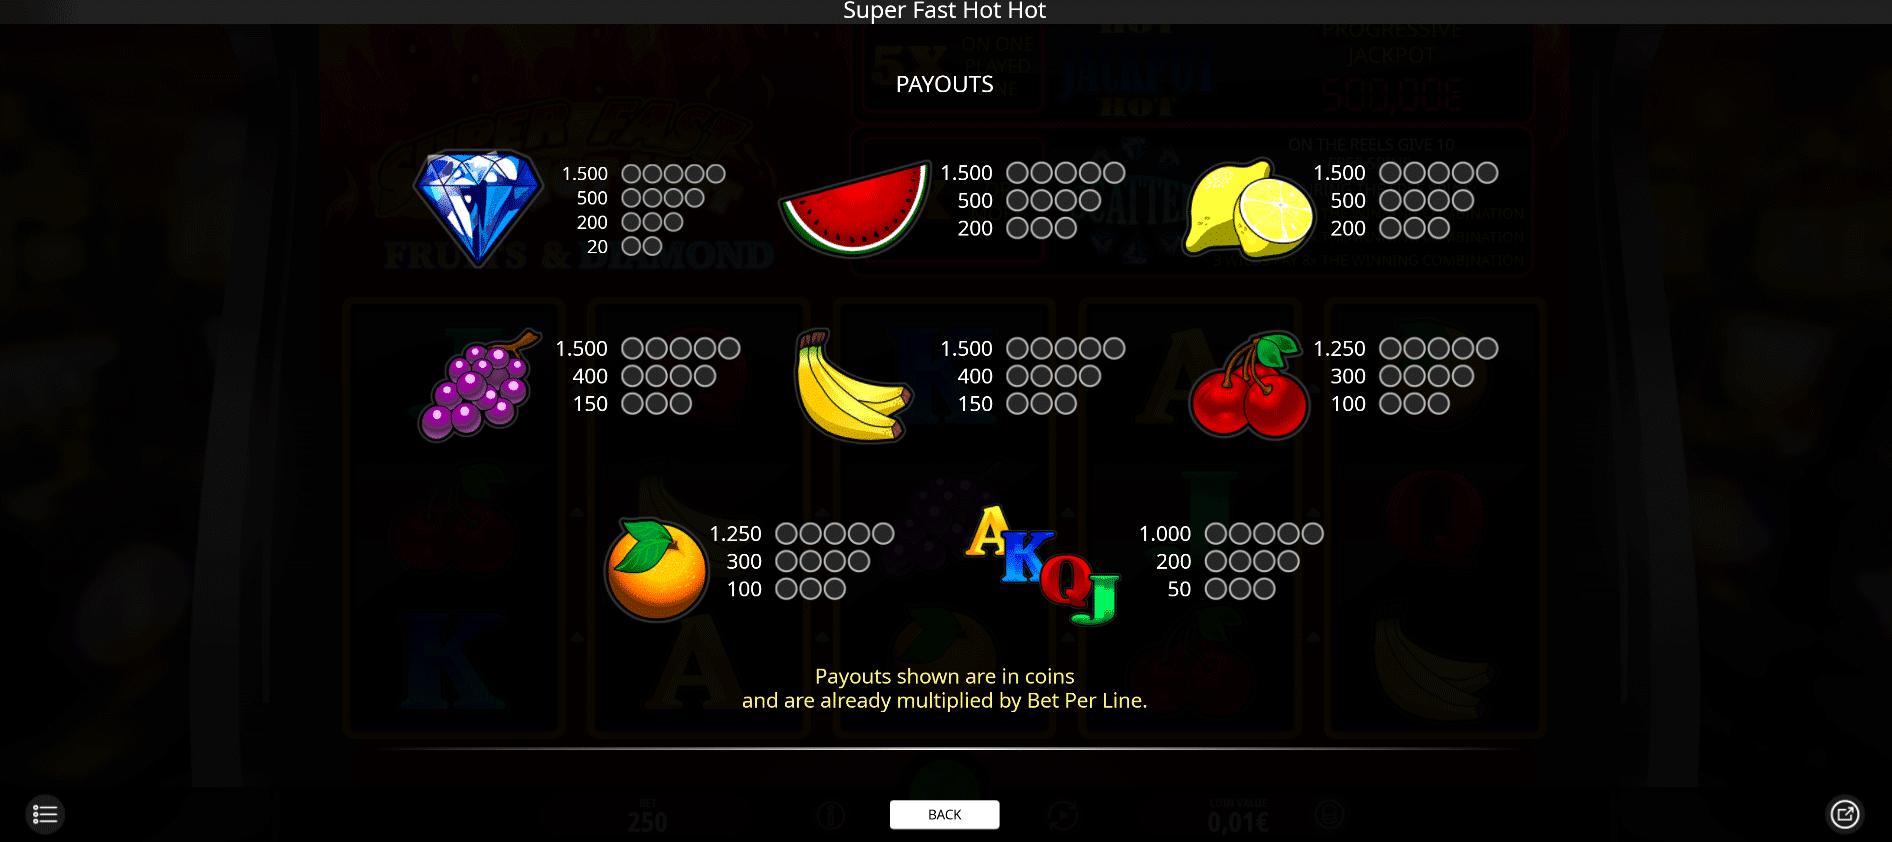 paytable della slot machine super fast hot hot online